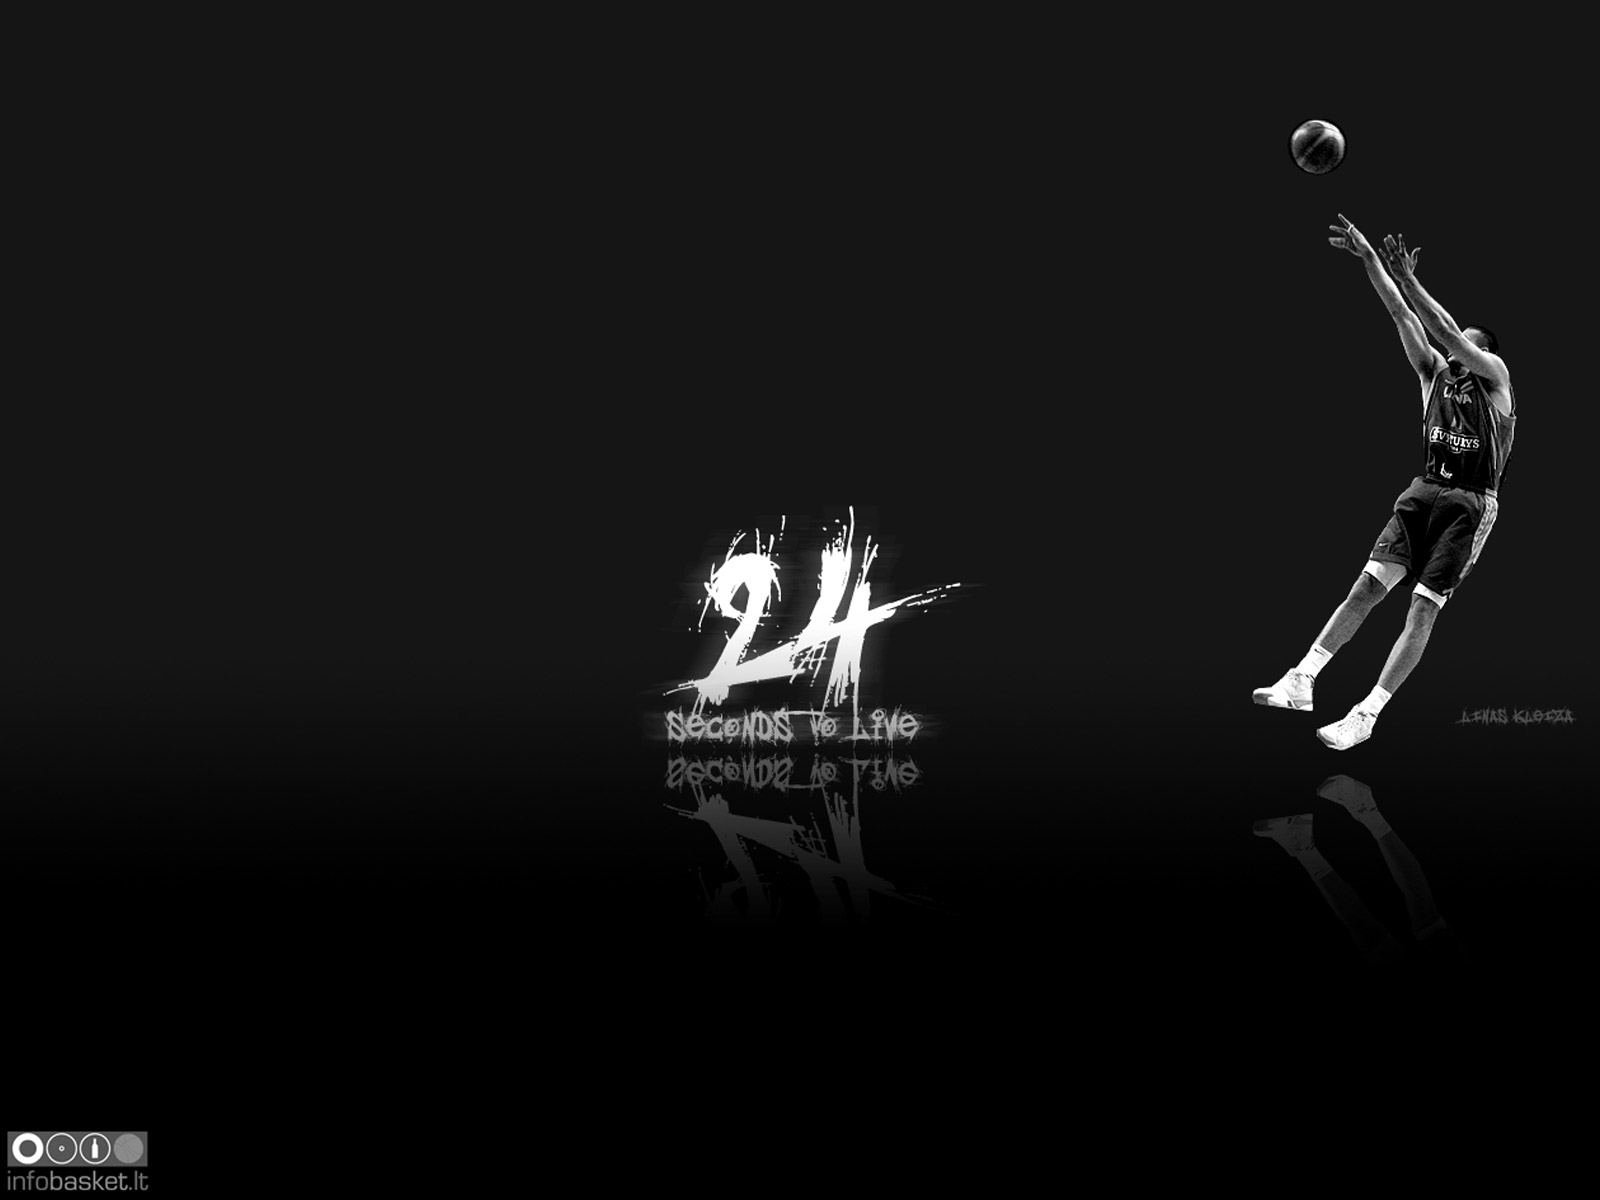 Free Download Basketball Desktop Wallpapers Gallery Basketball